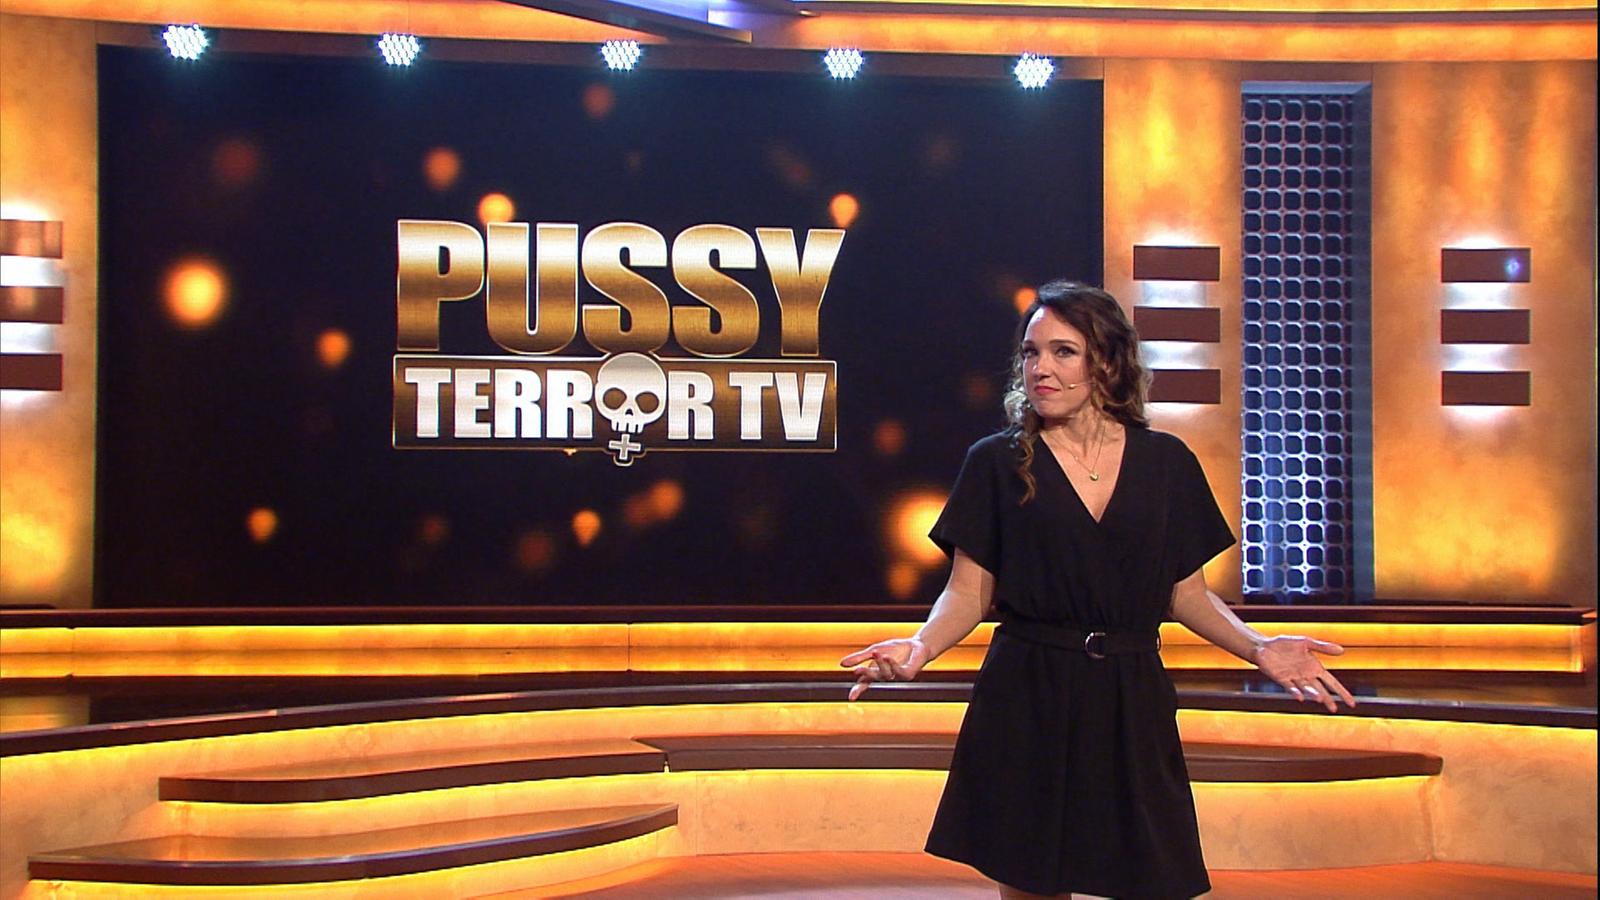 Pussy Terror Tv Ganze Folge